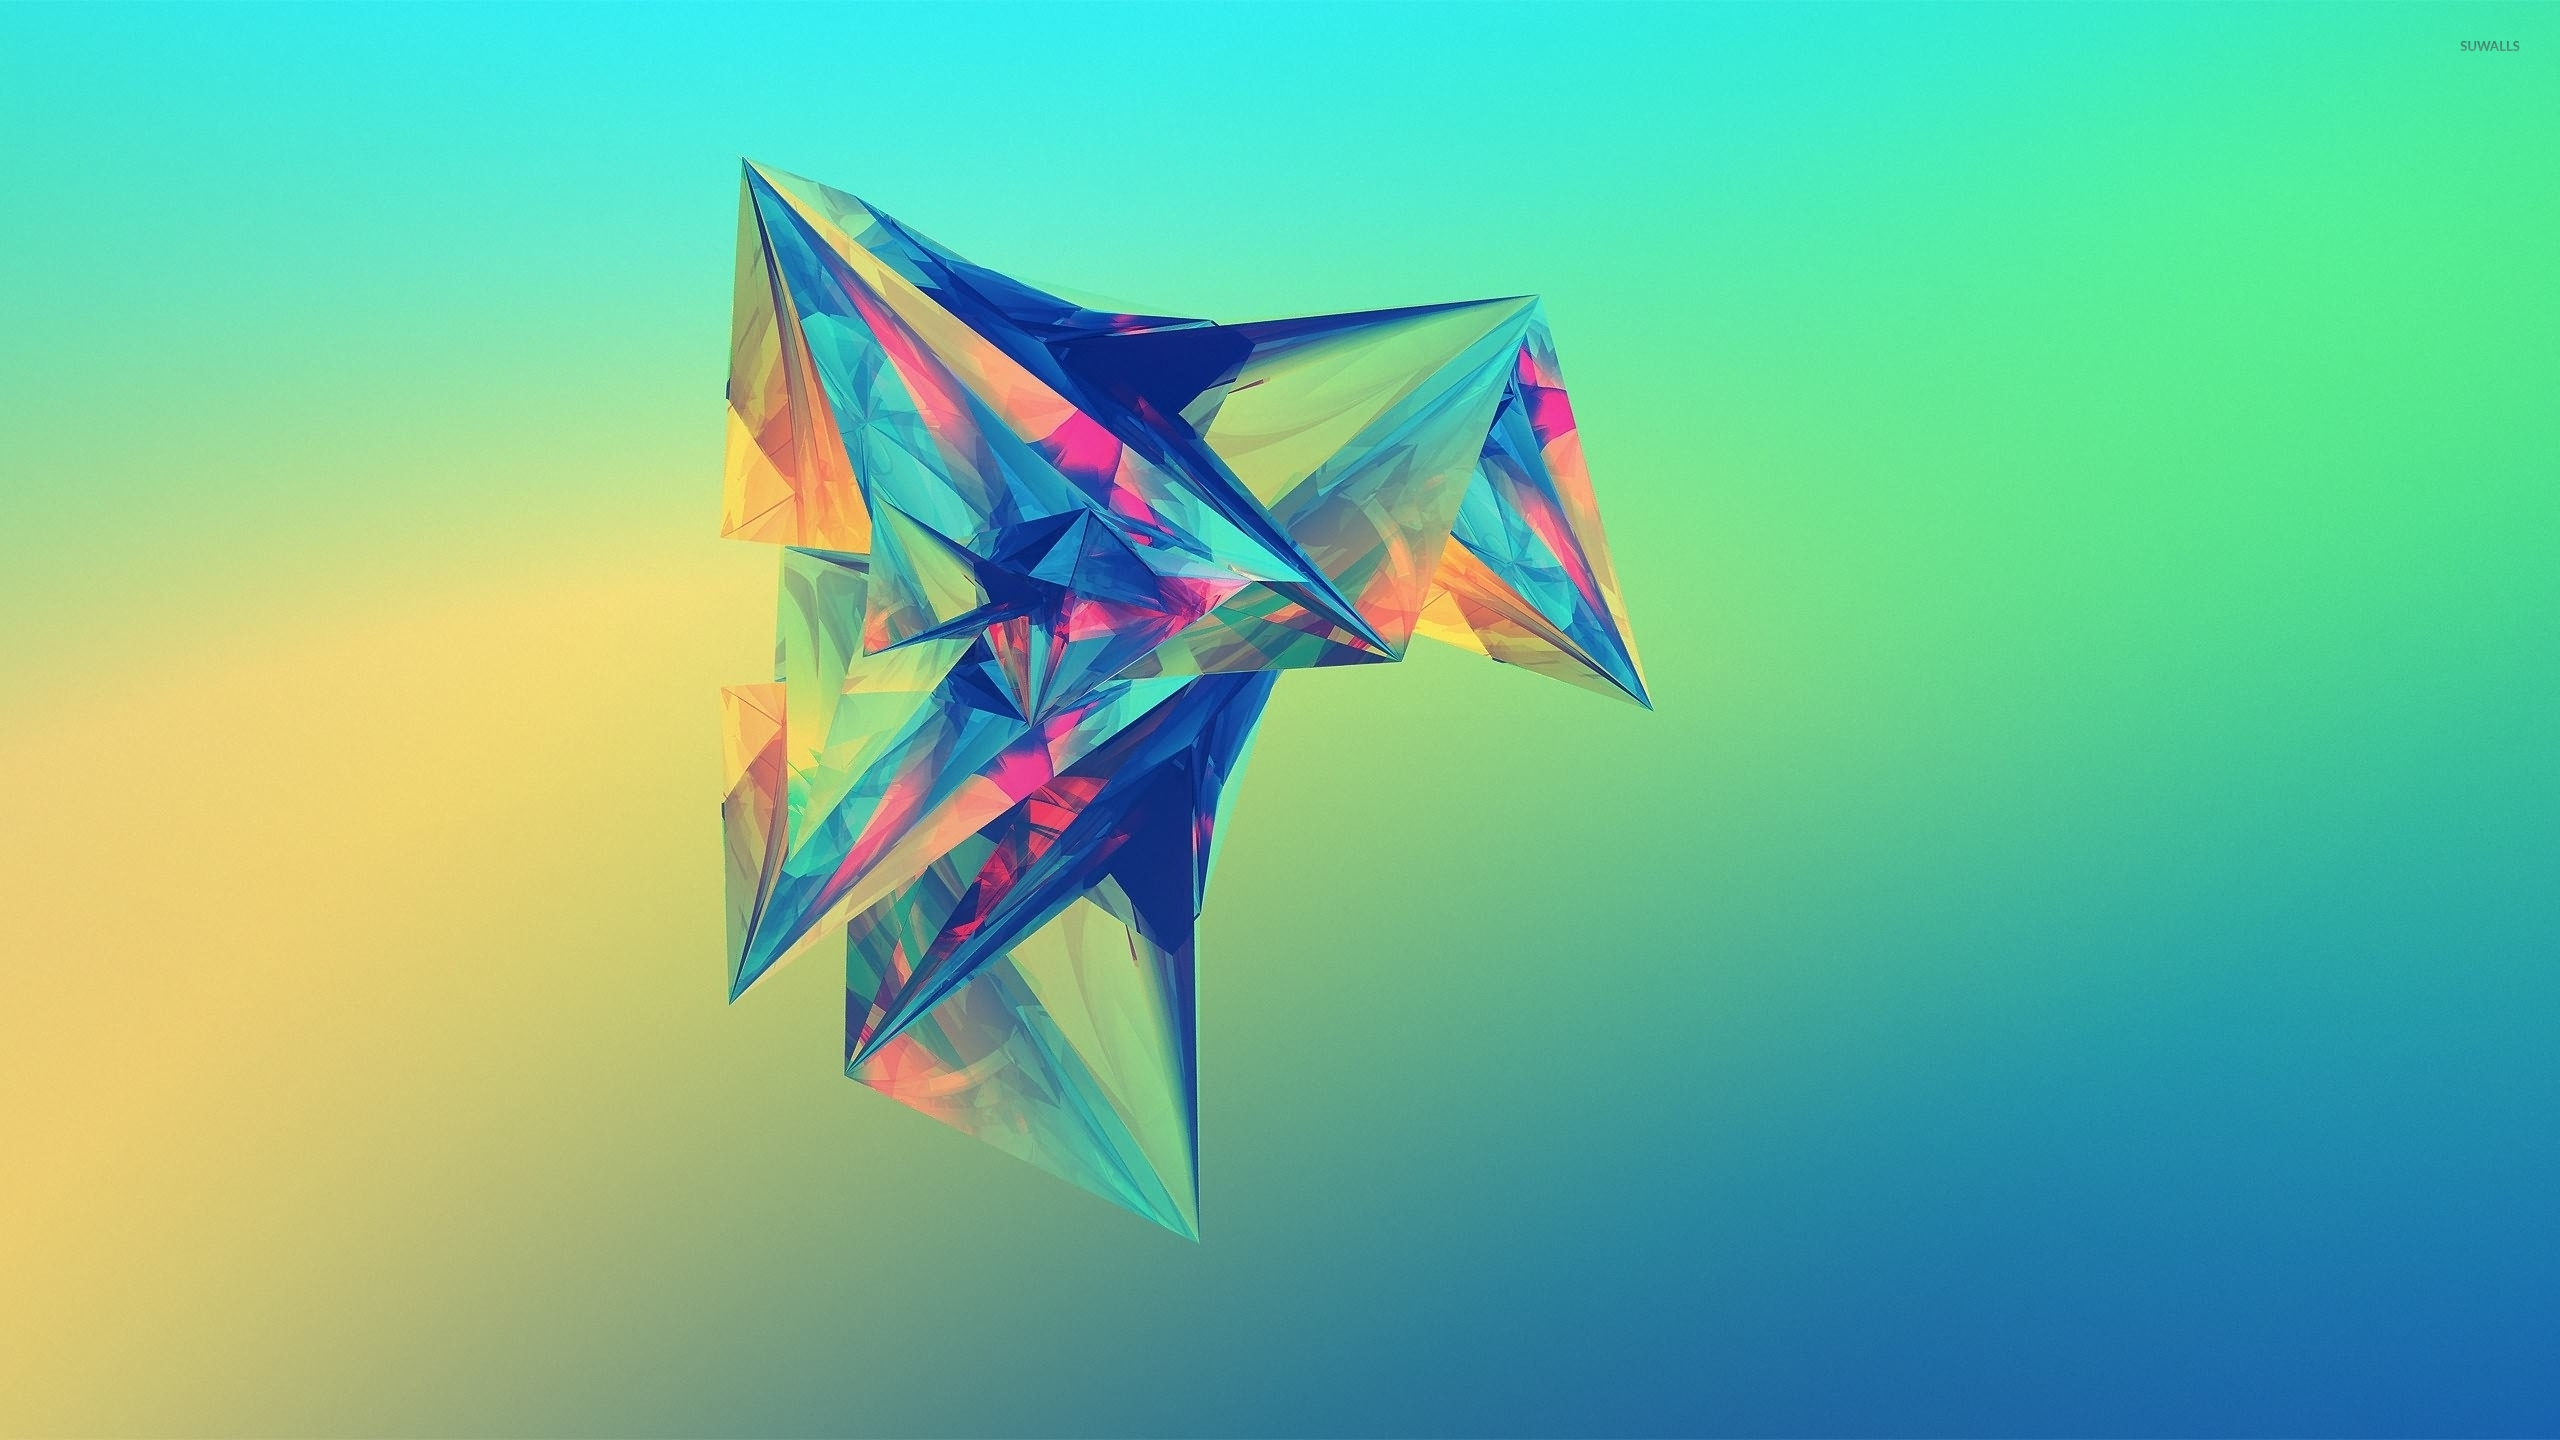 Sun Light Upon The Colorful Diamond Wallpaper Abstract